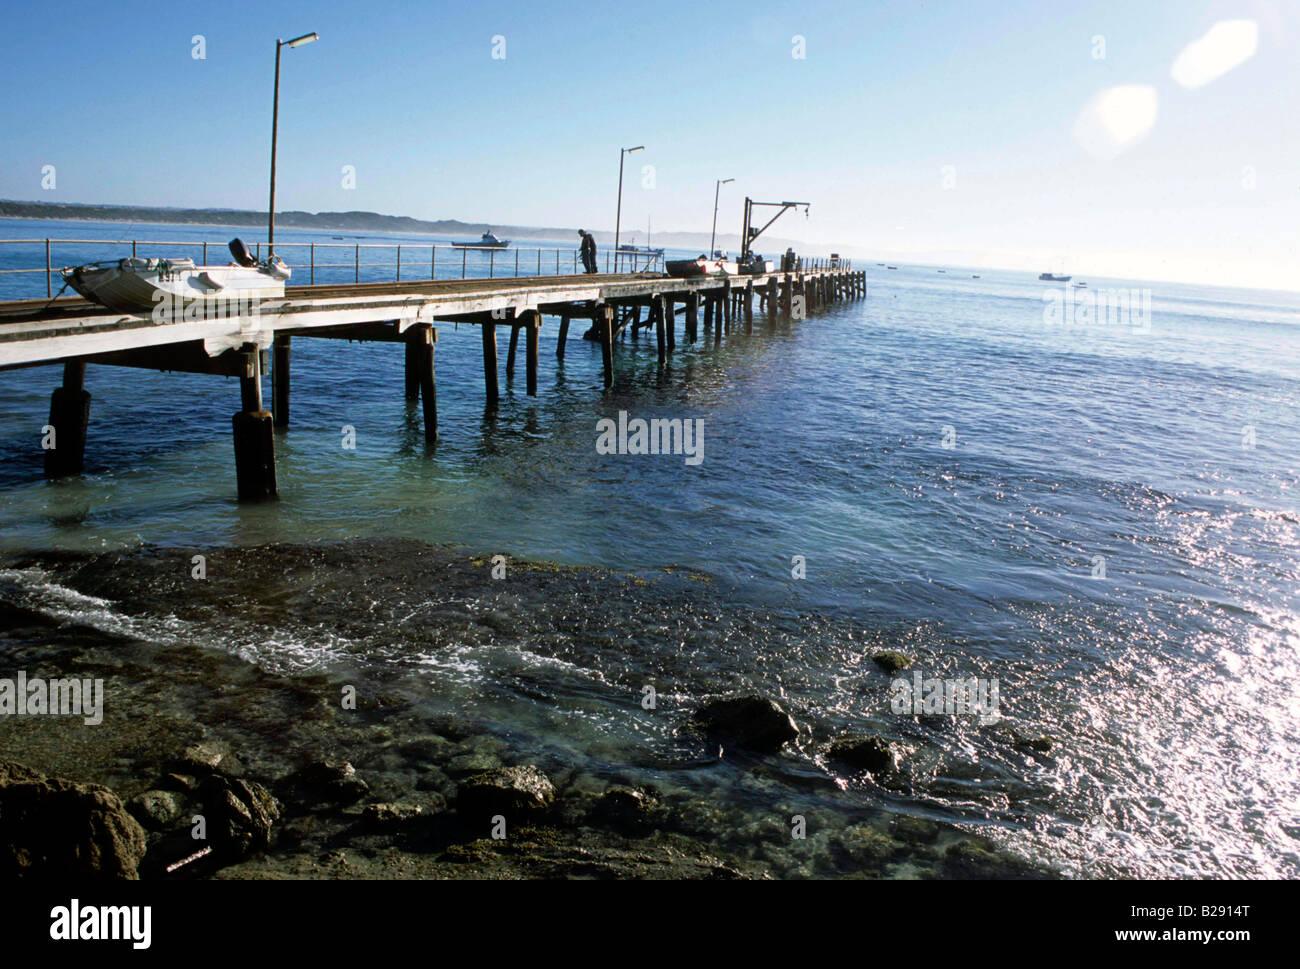 Pier Kangaroo Island Australia Date 23 04 2008 Ref ZB955 113876 0010 COMPULSORY CREDIT World Pictures Photoshot - Stock Image